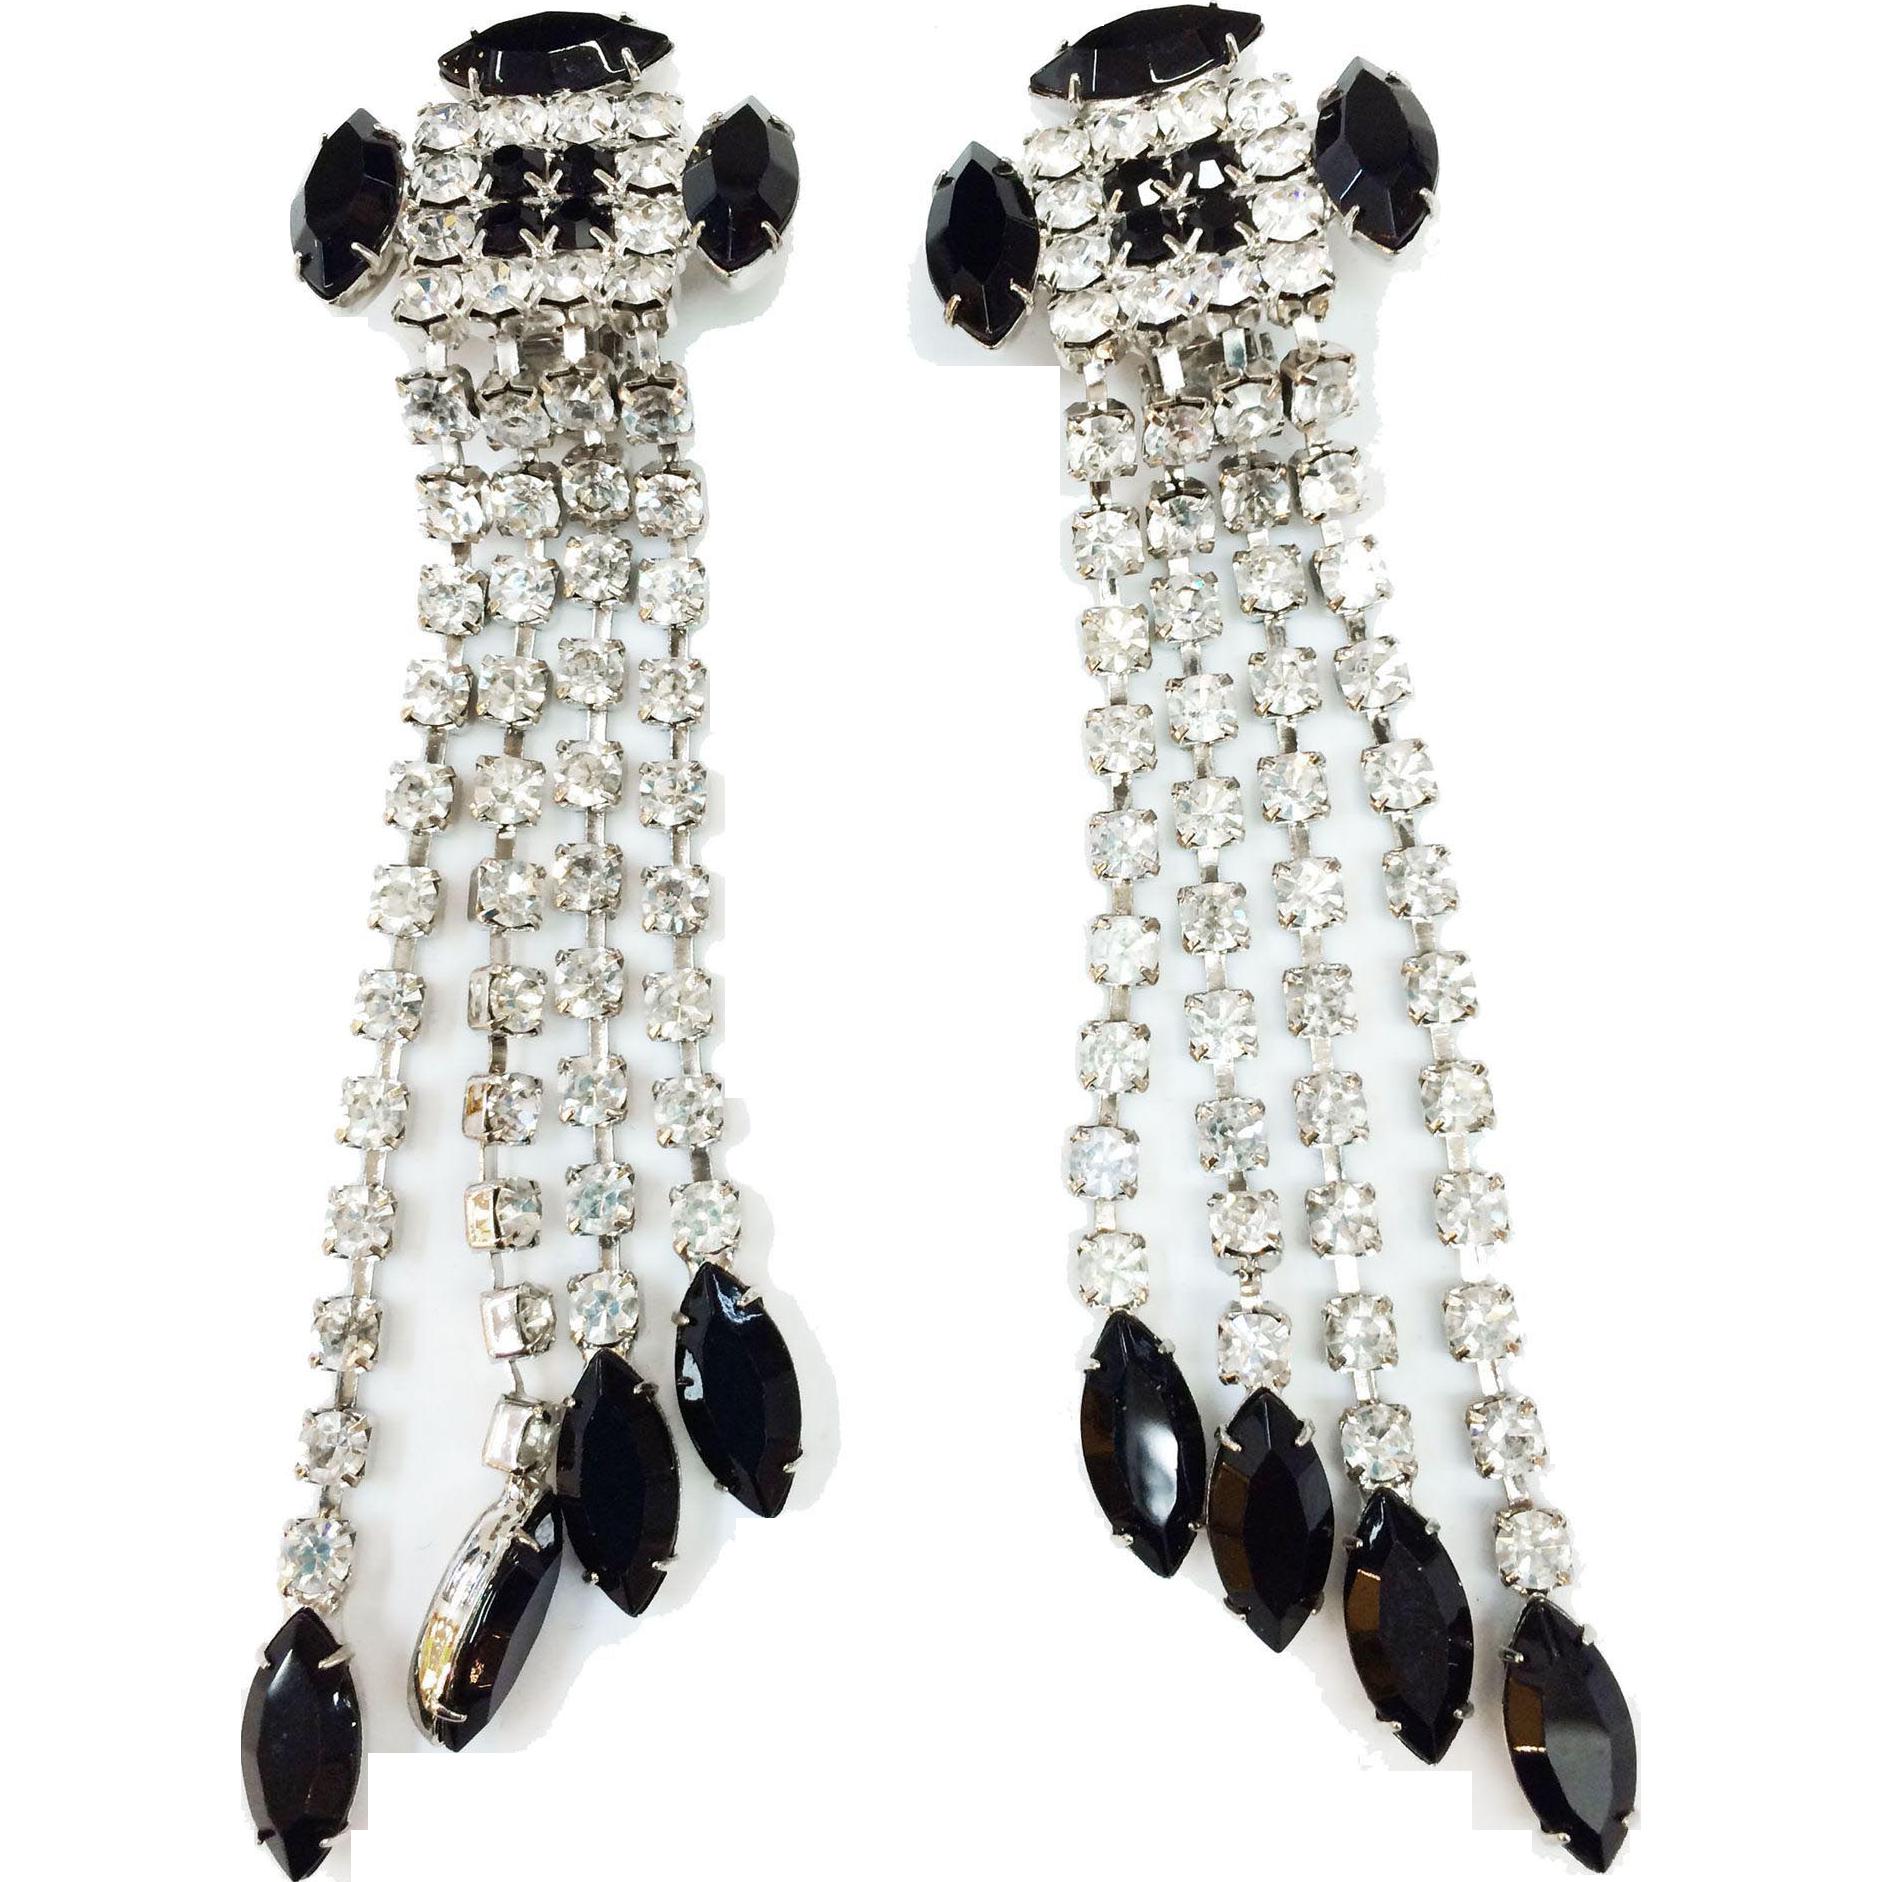 Ultra Long Drama Queen Clear and Black Tassel Rhinestone Earrings